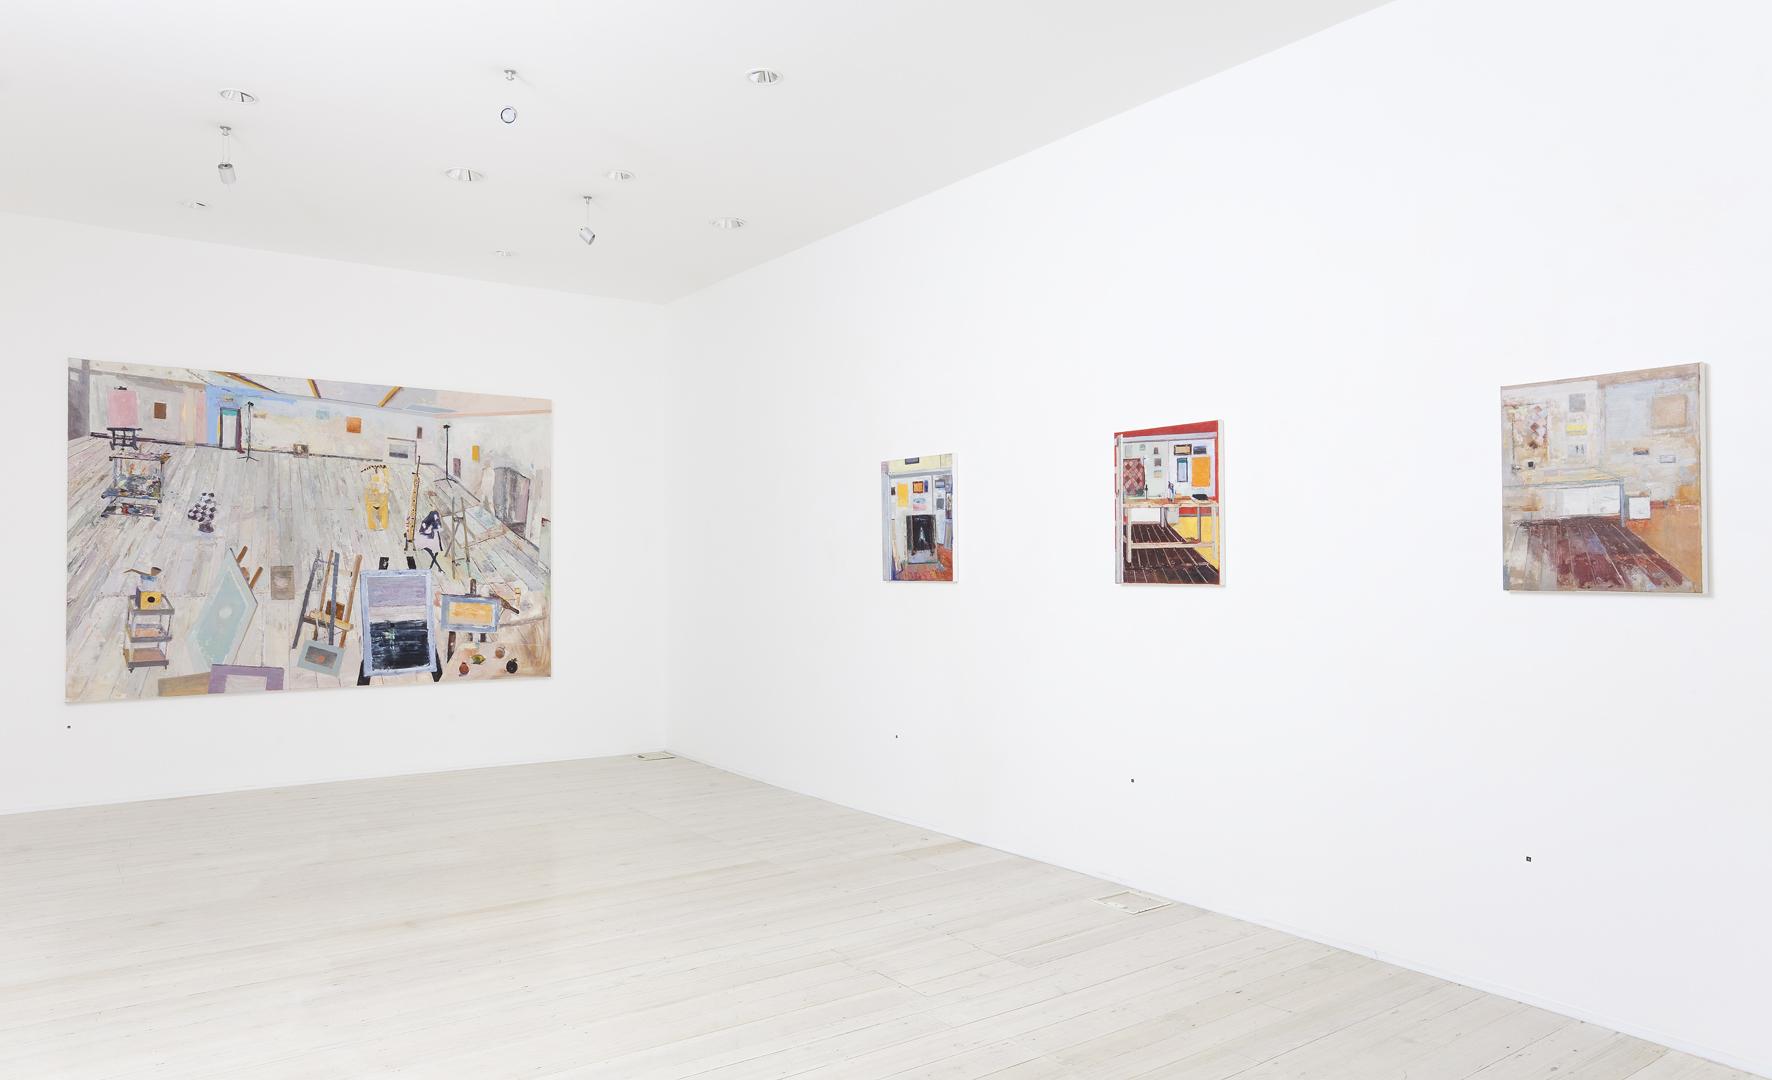 Installation view of Jelle Van Den Berg's paintings